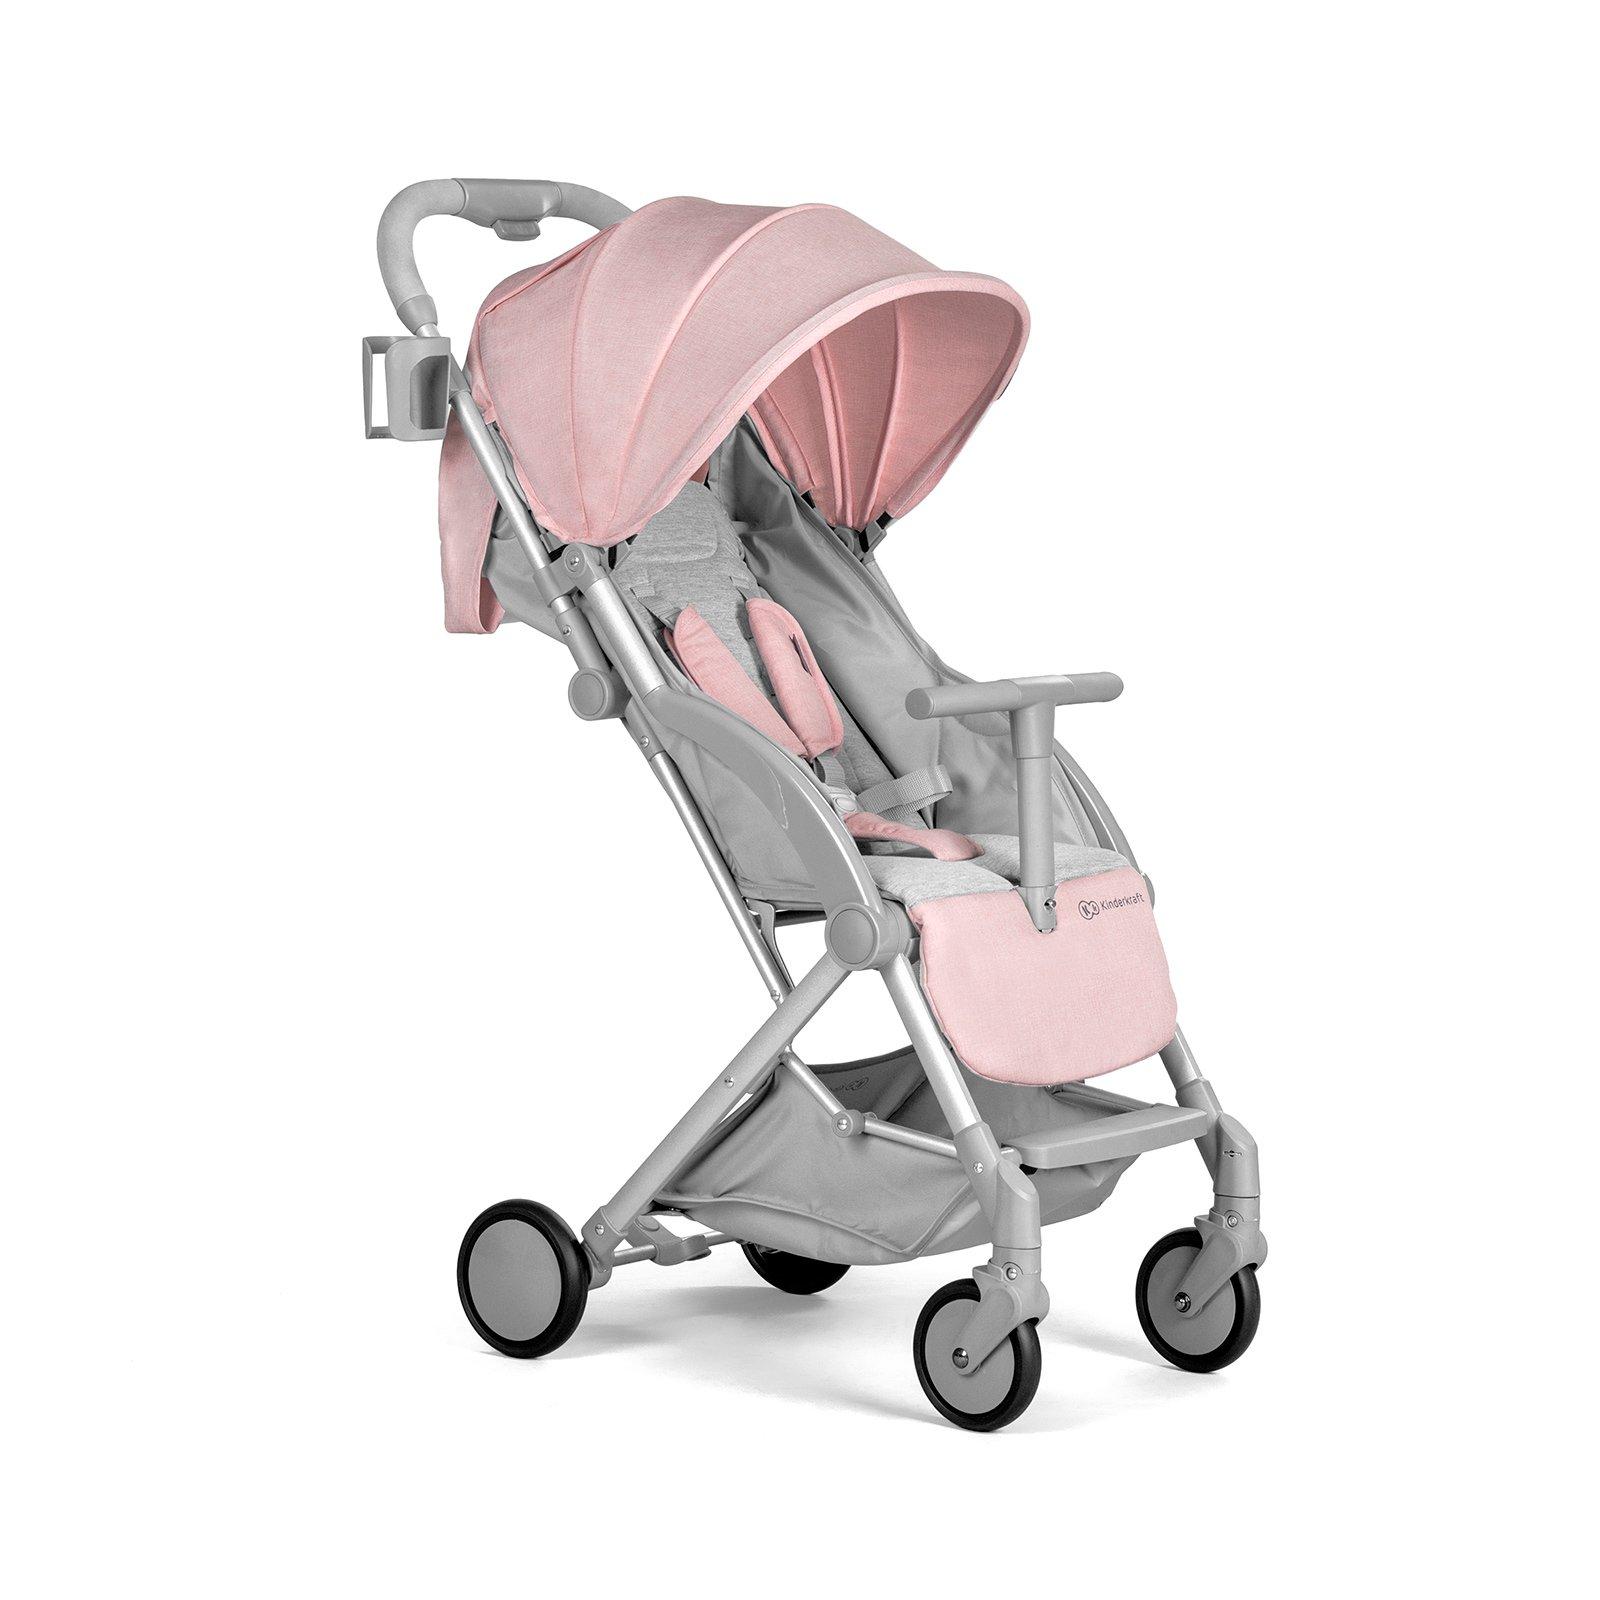 Cochecito Kinderkraft Pilot ligero para bebés product image